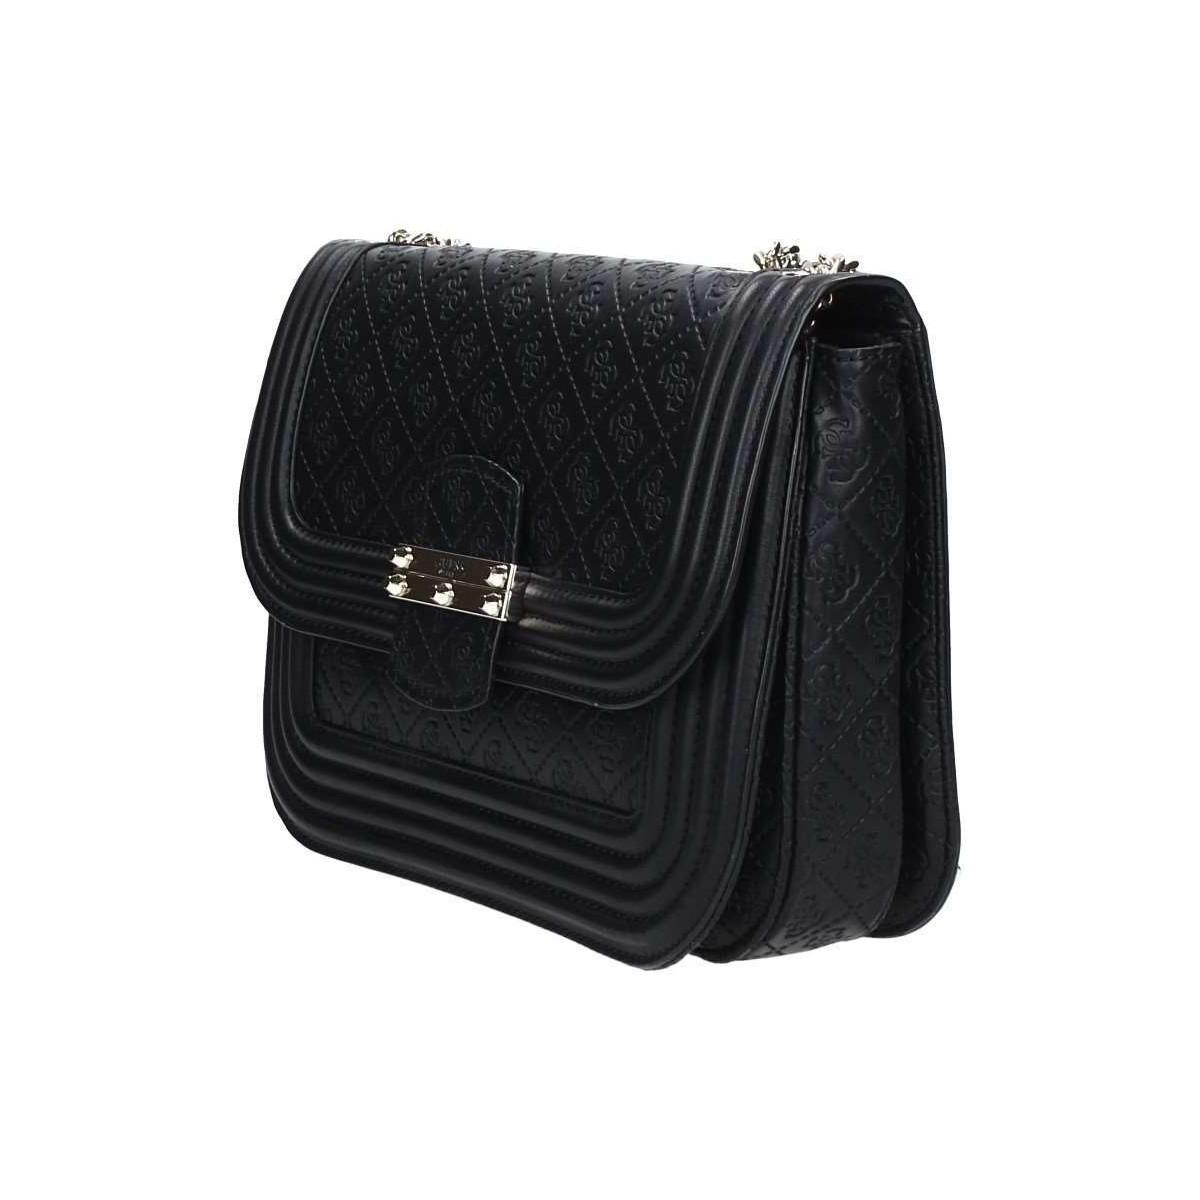 Guess Hwsg67 87200 Borsa A Mano Women s Handbags In Black in Black ... fe4d6d7b4fffa